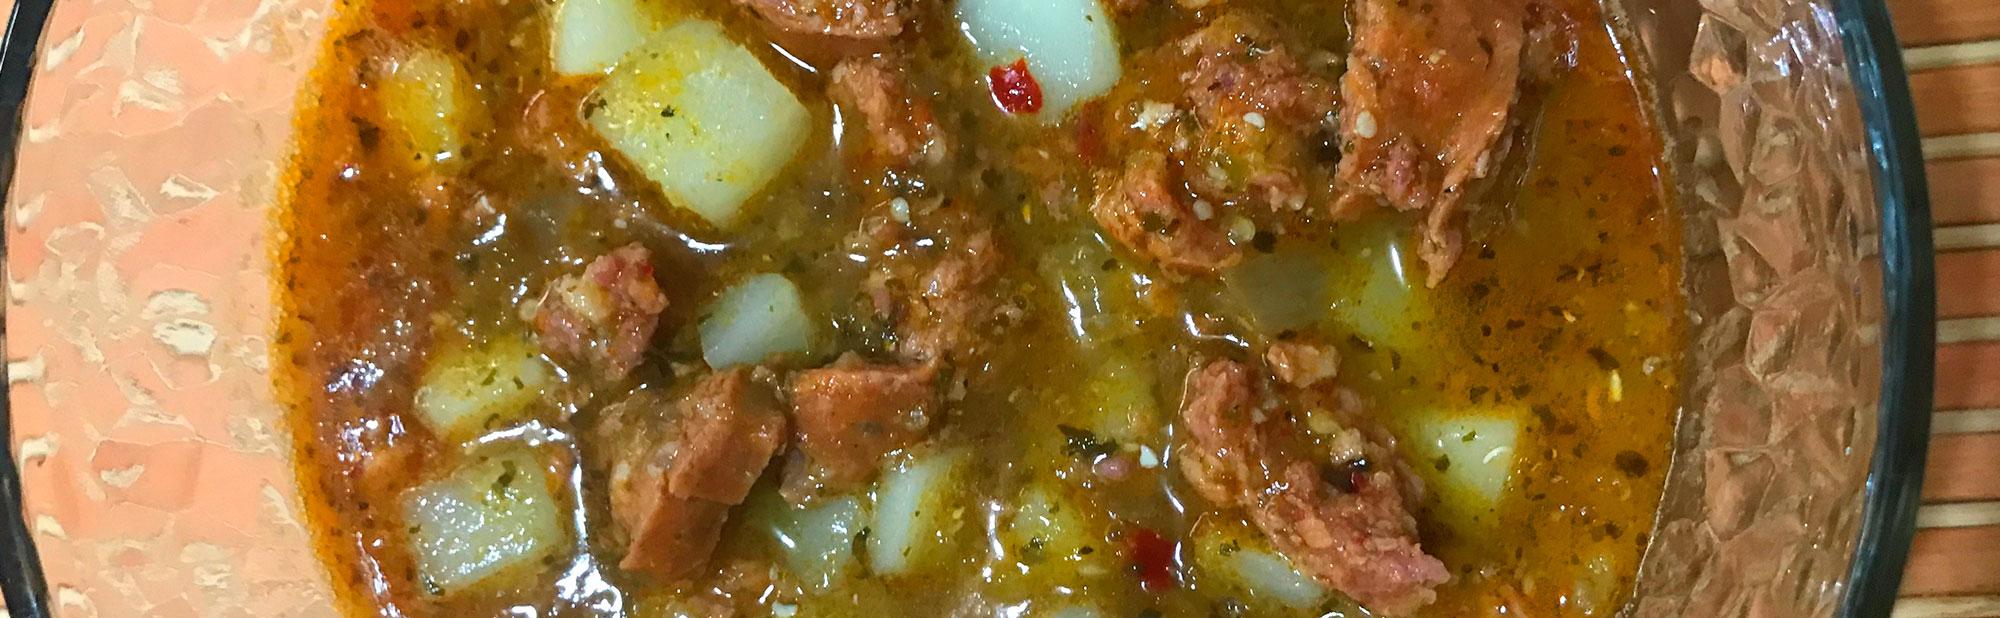 La Antojadera | Longaniza en Salsa Verde